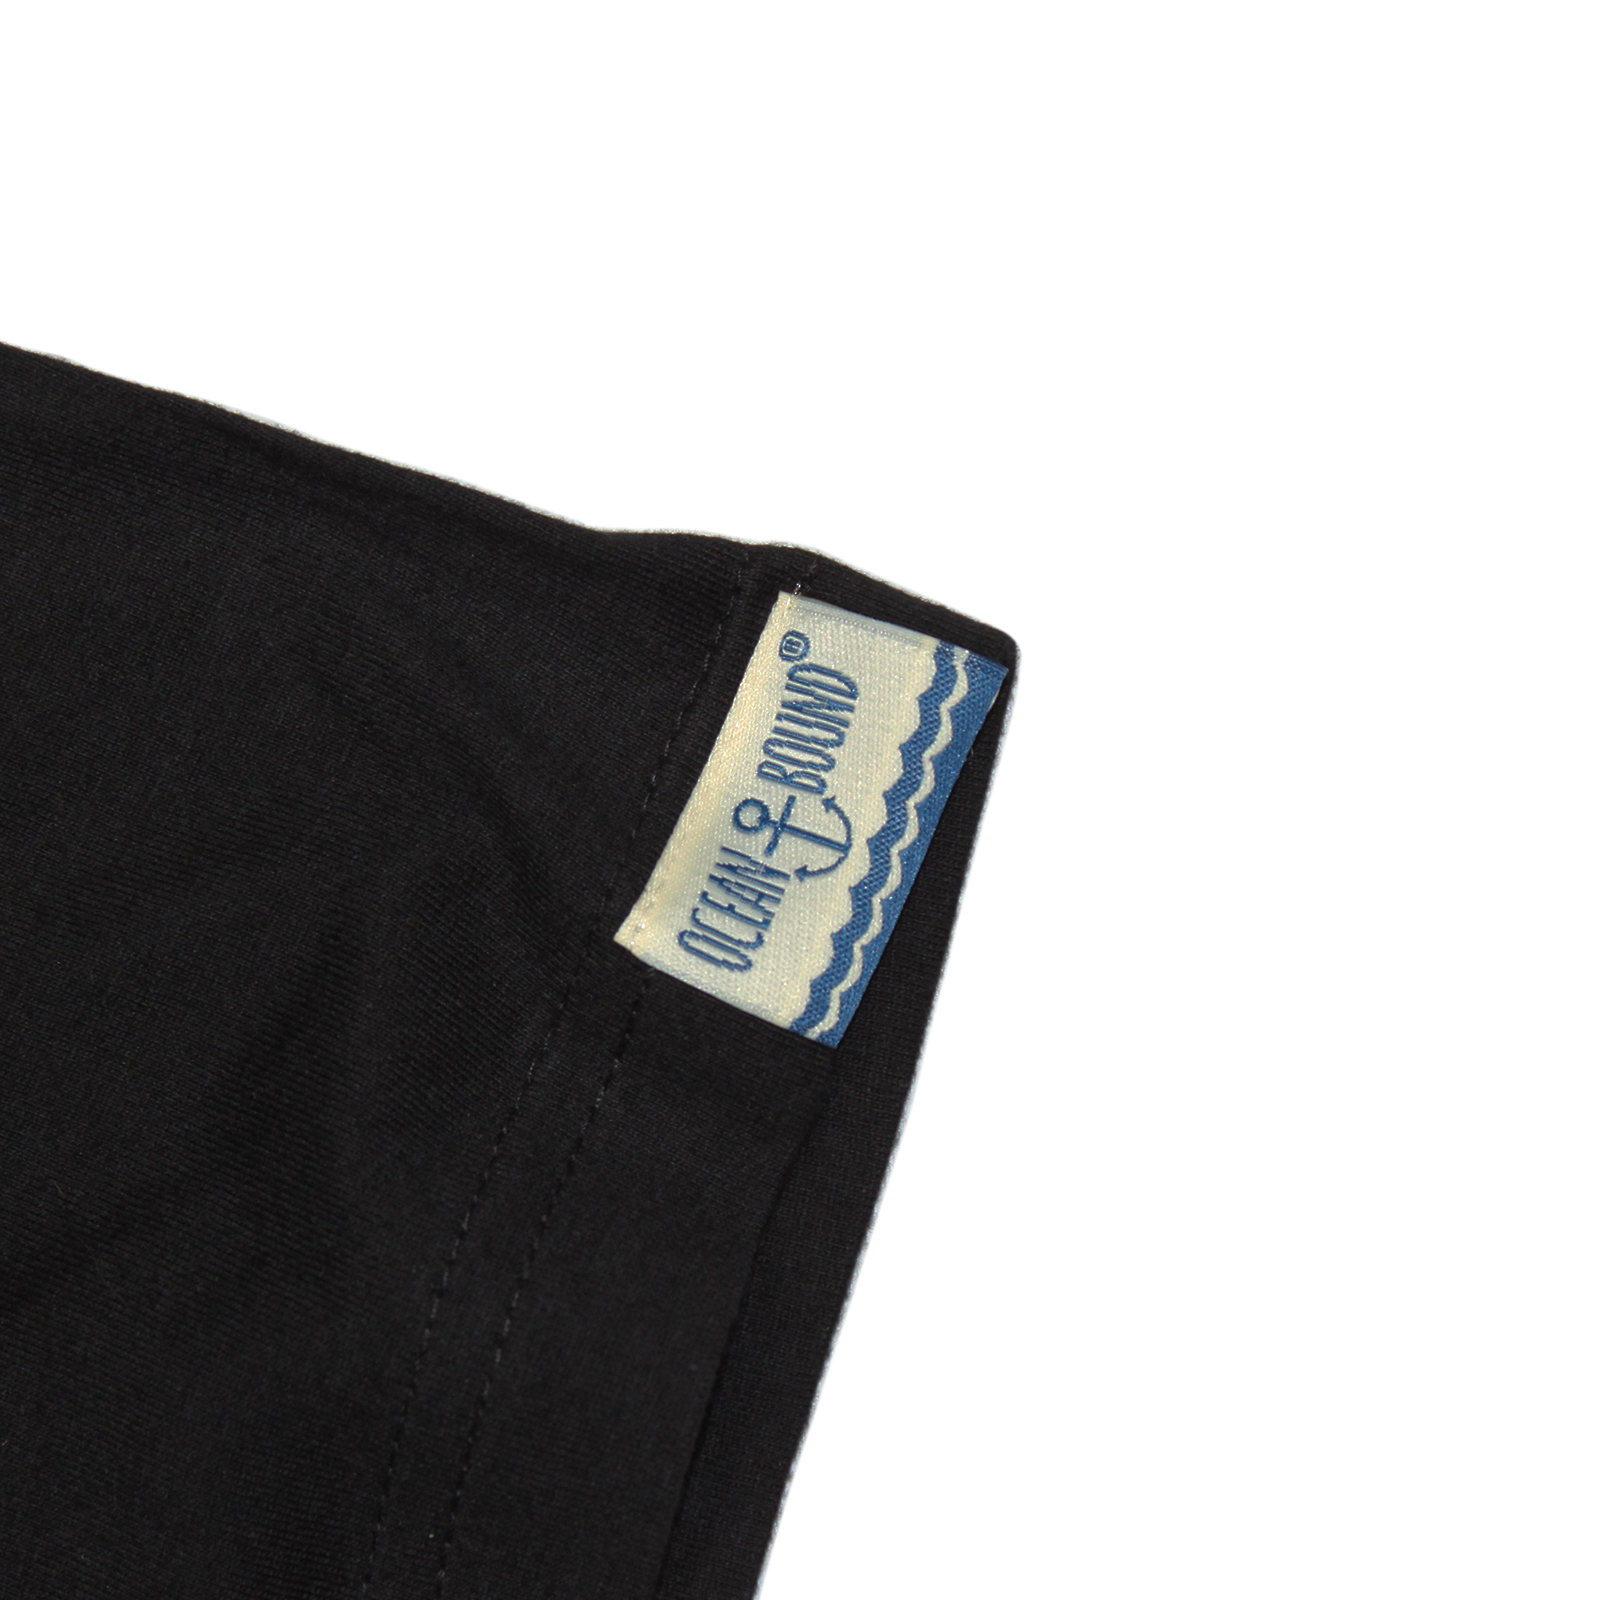 OOB Kaleidostroke Funny T Shirt Birthday Joke tee Novelty tshirt T-SHIRT